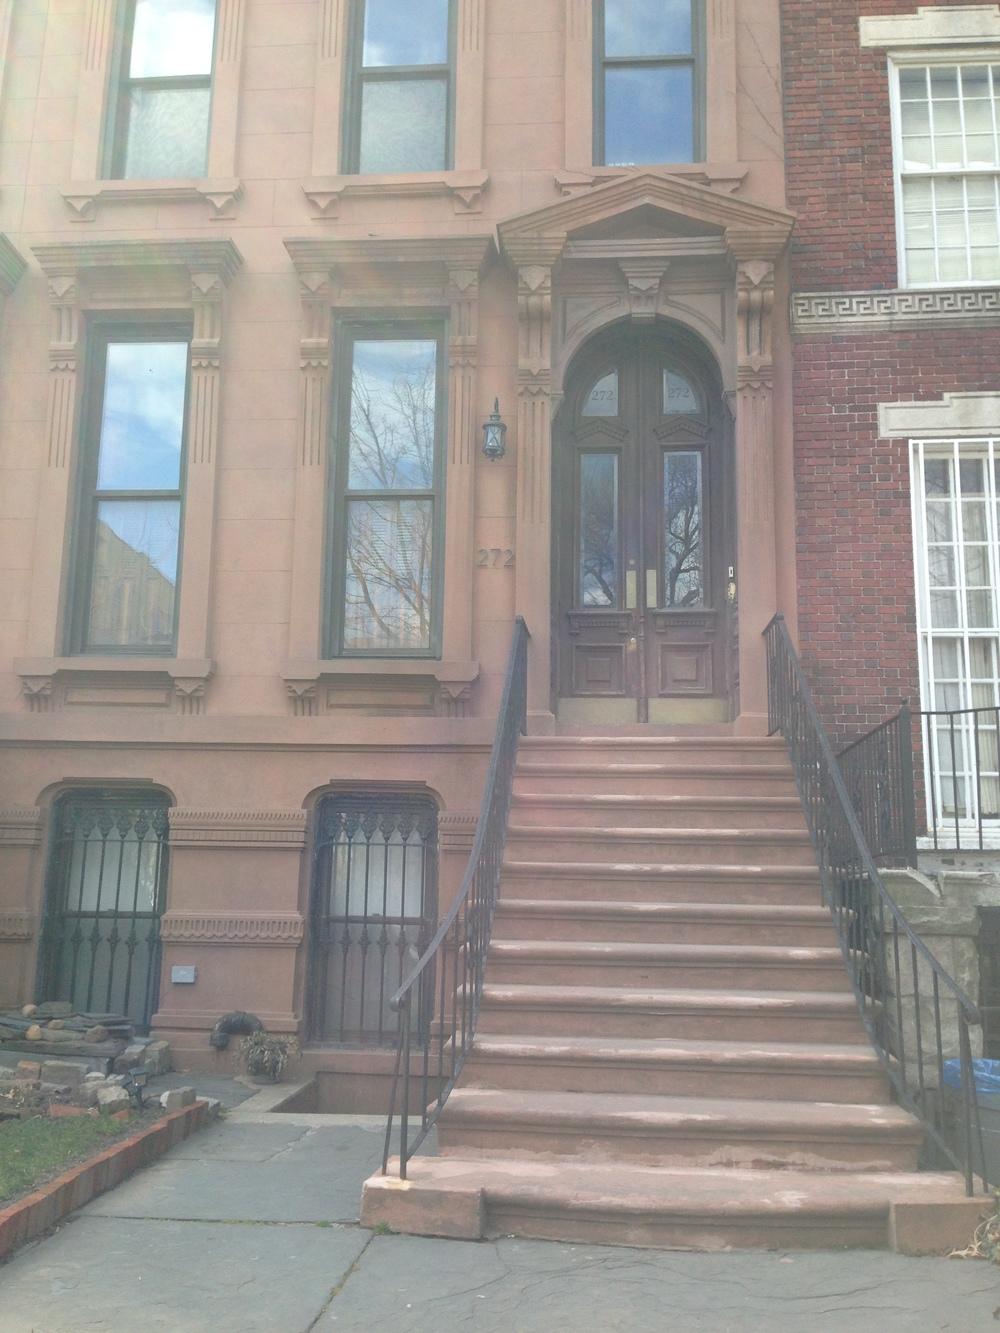 272 Clinton Ave.